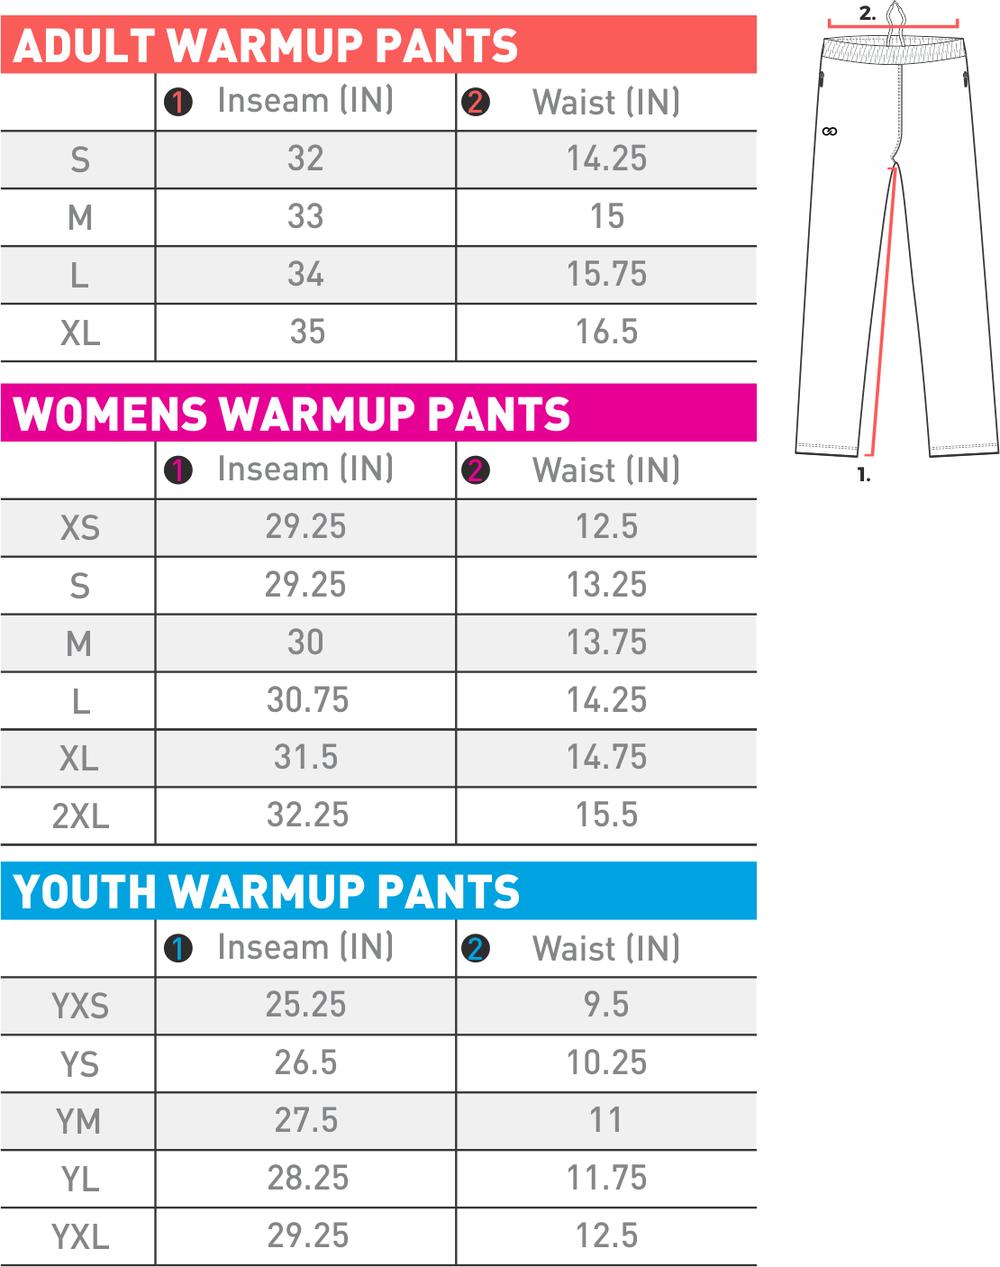 Warmups Pants Size Chart.png